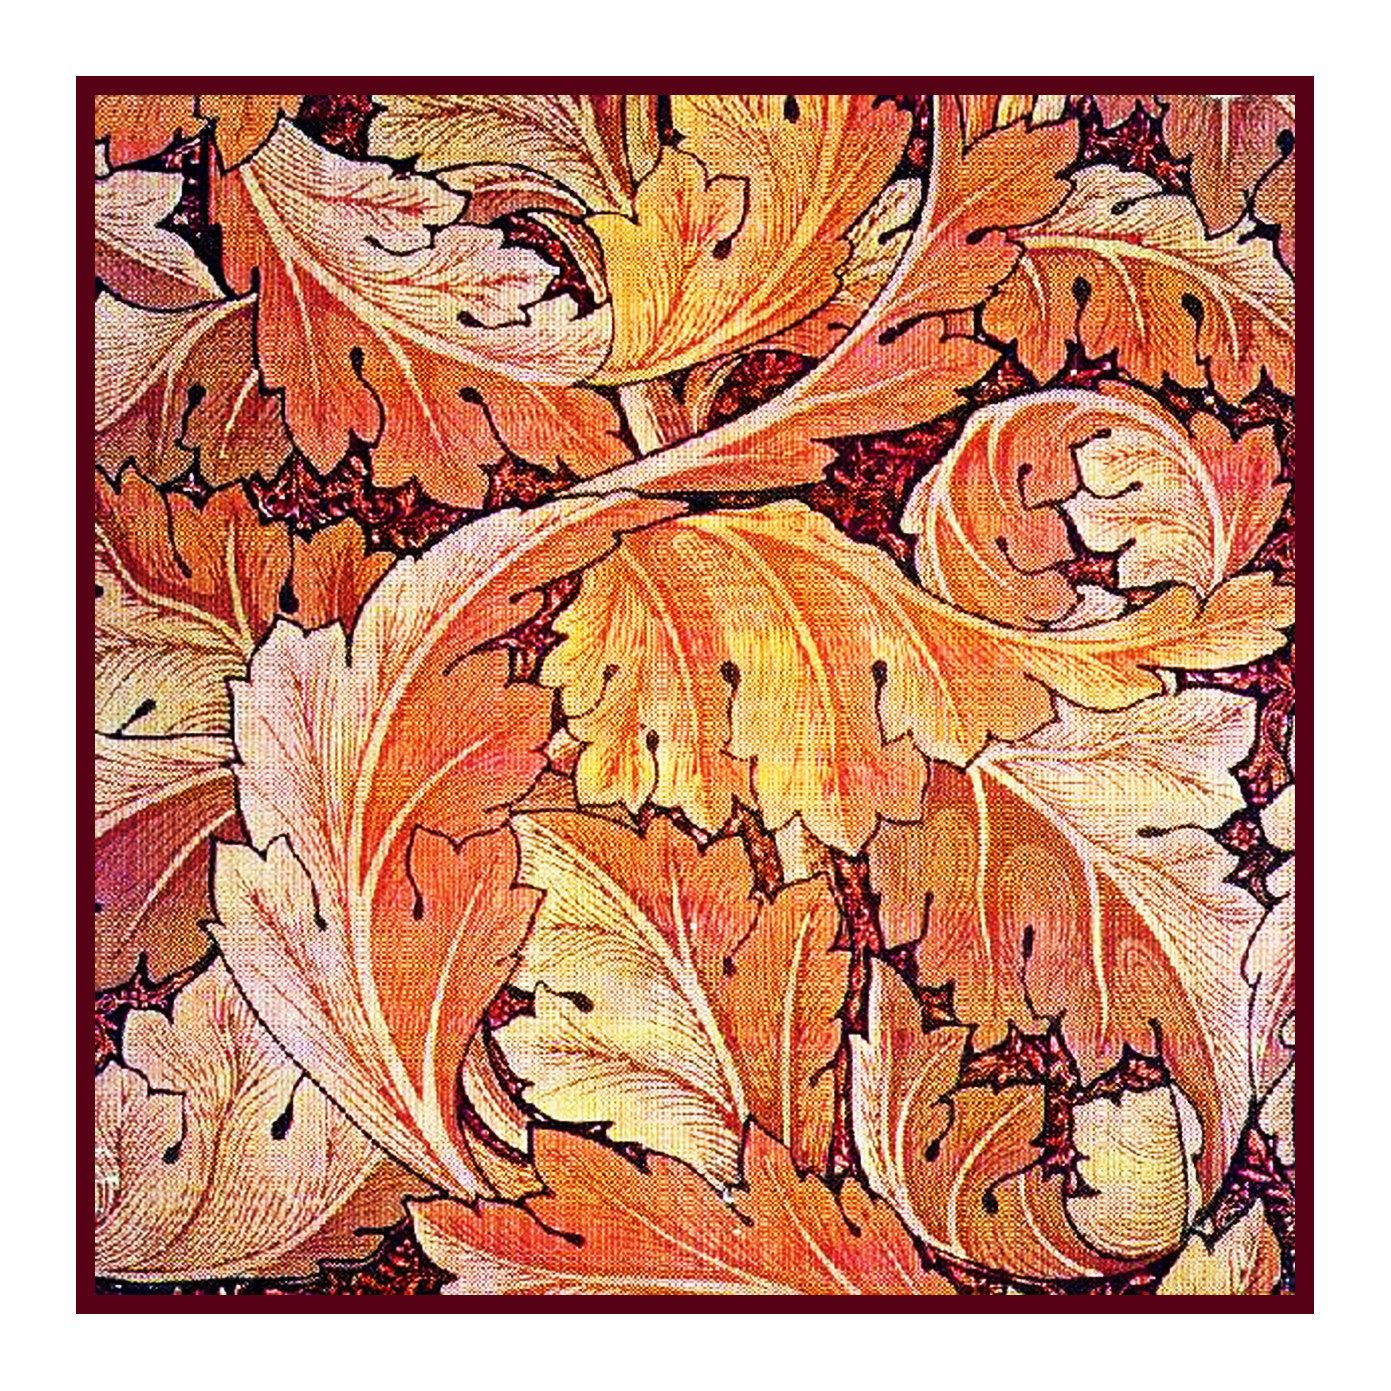 Orenco Originals William Morris Acanthus Leaves Owl Counted Cross Stitch Pattern